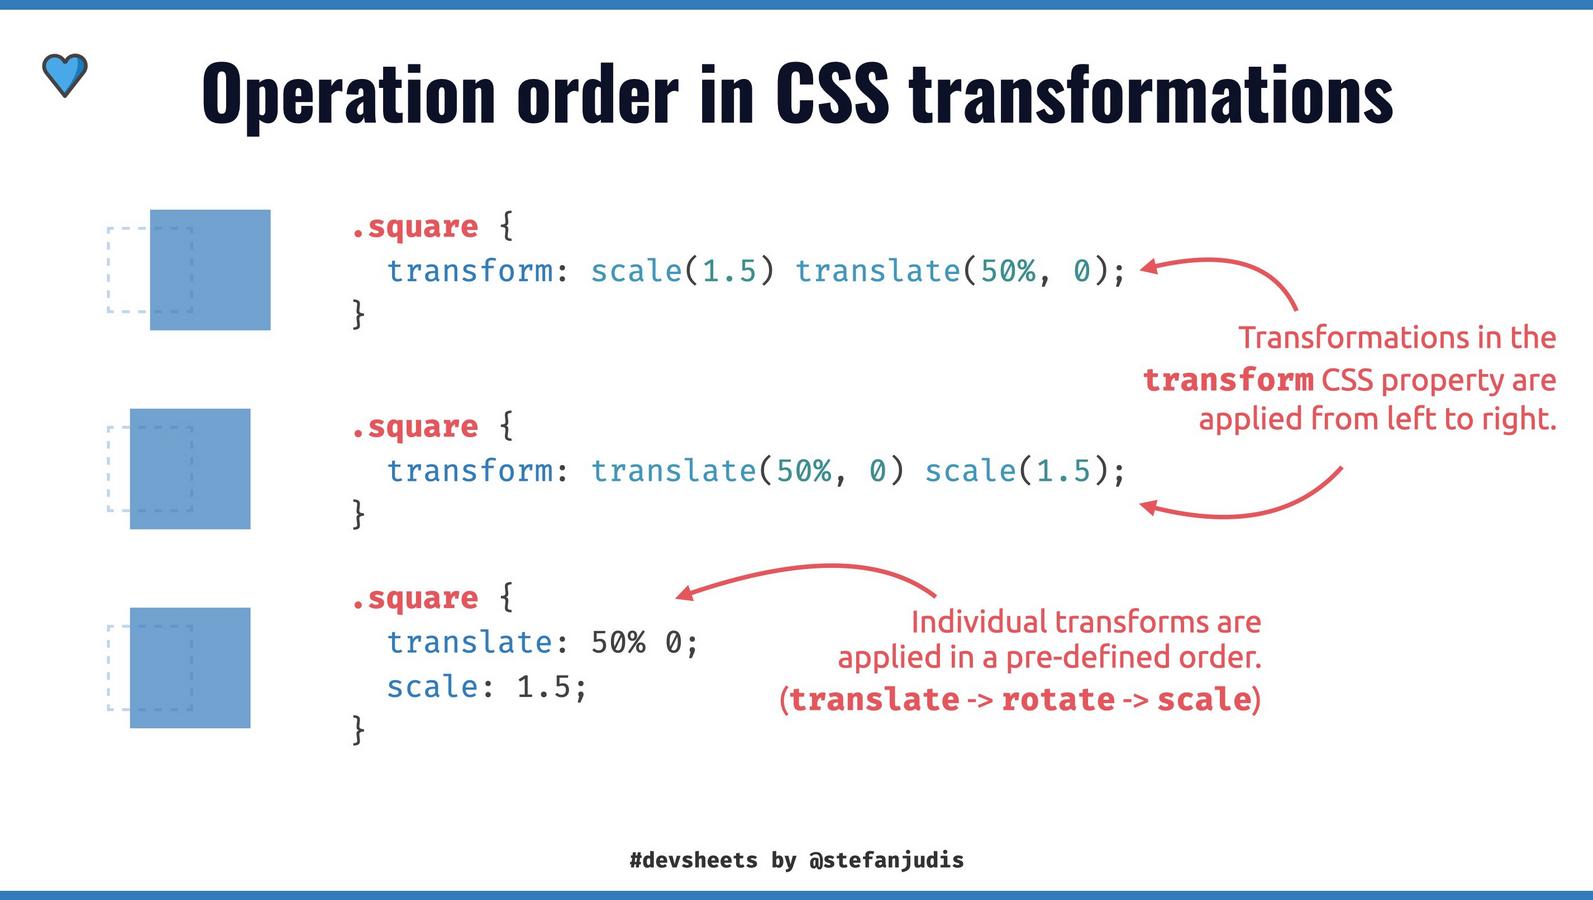 DevSheet explaining the operation order of CSS transforms